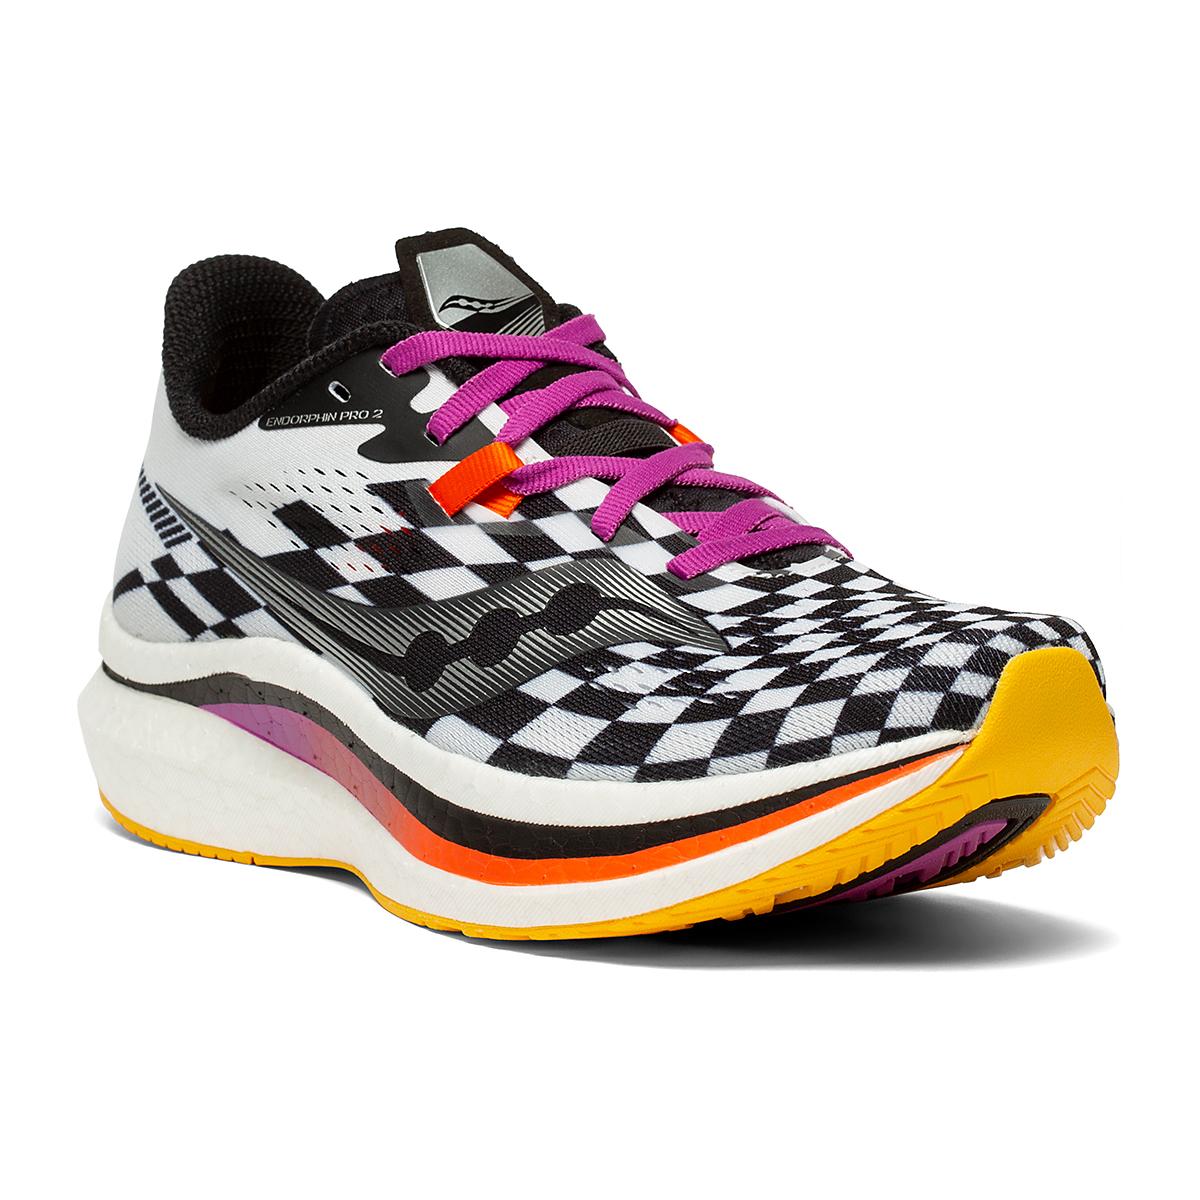 Women's Saucony Endorphin Pro 2 Running Shoe - Color: Reverie - Size: 5 - Width: Regular, Reverie, large, image 5